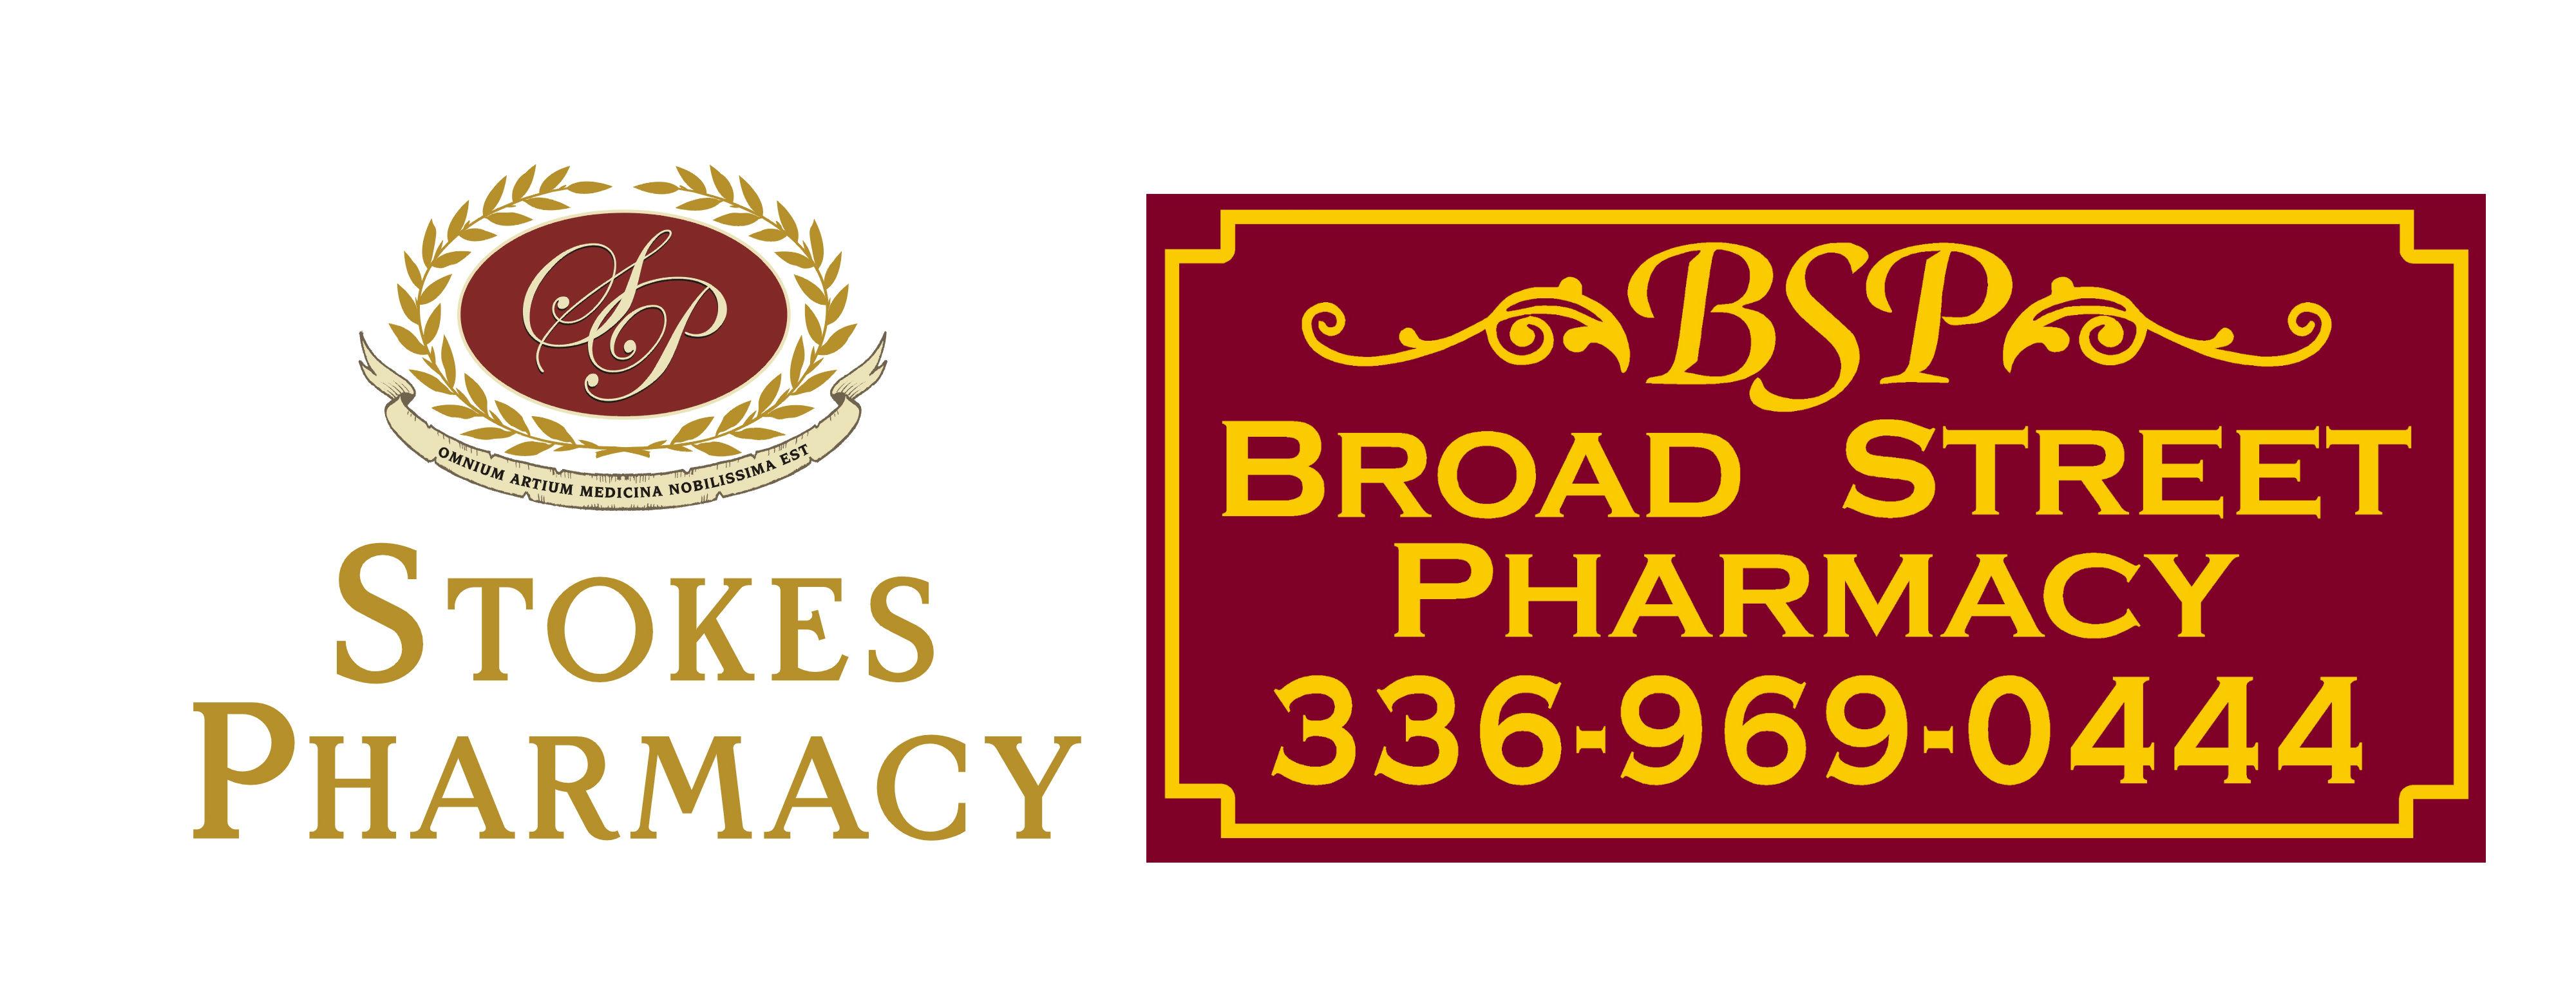 Stokes Pharmacy